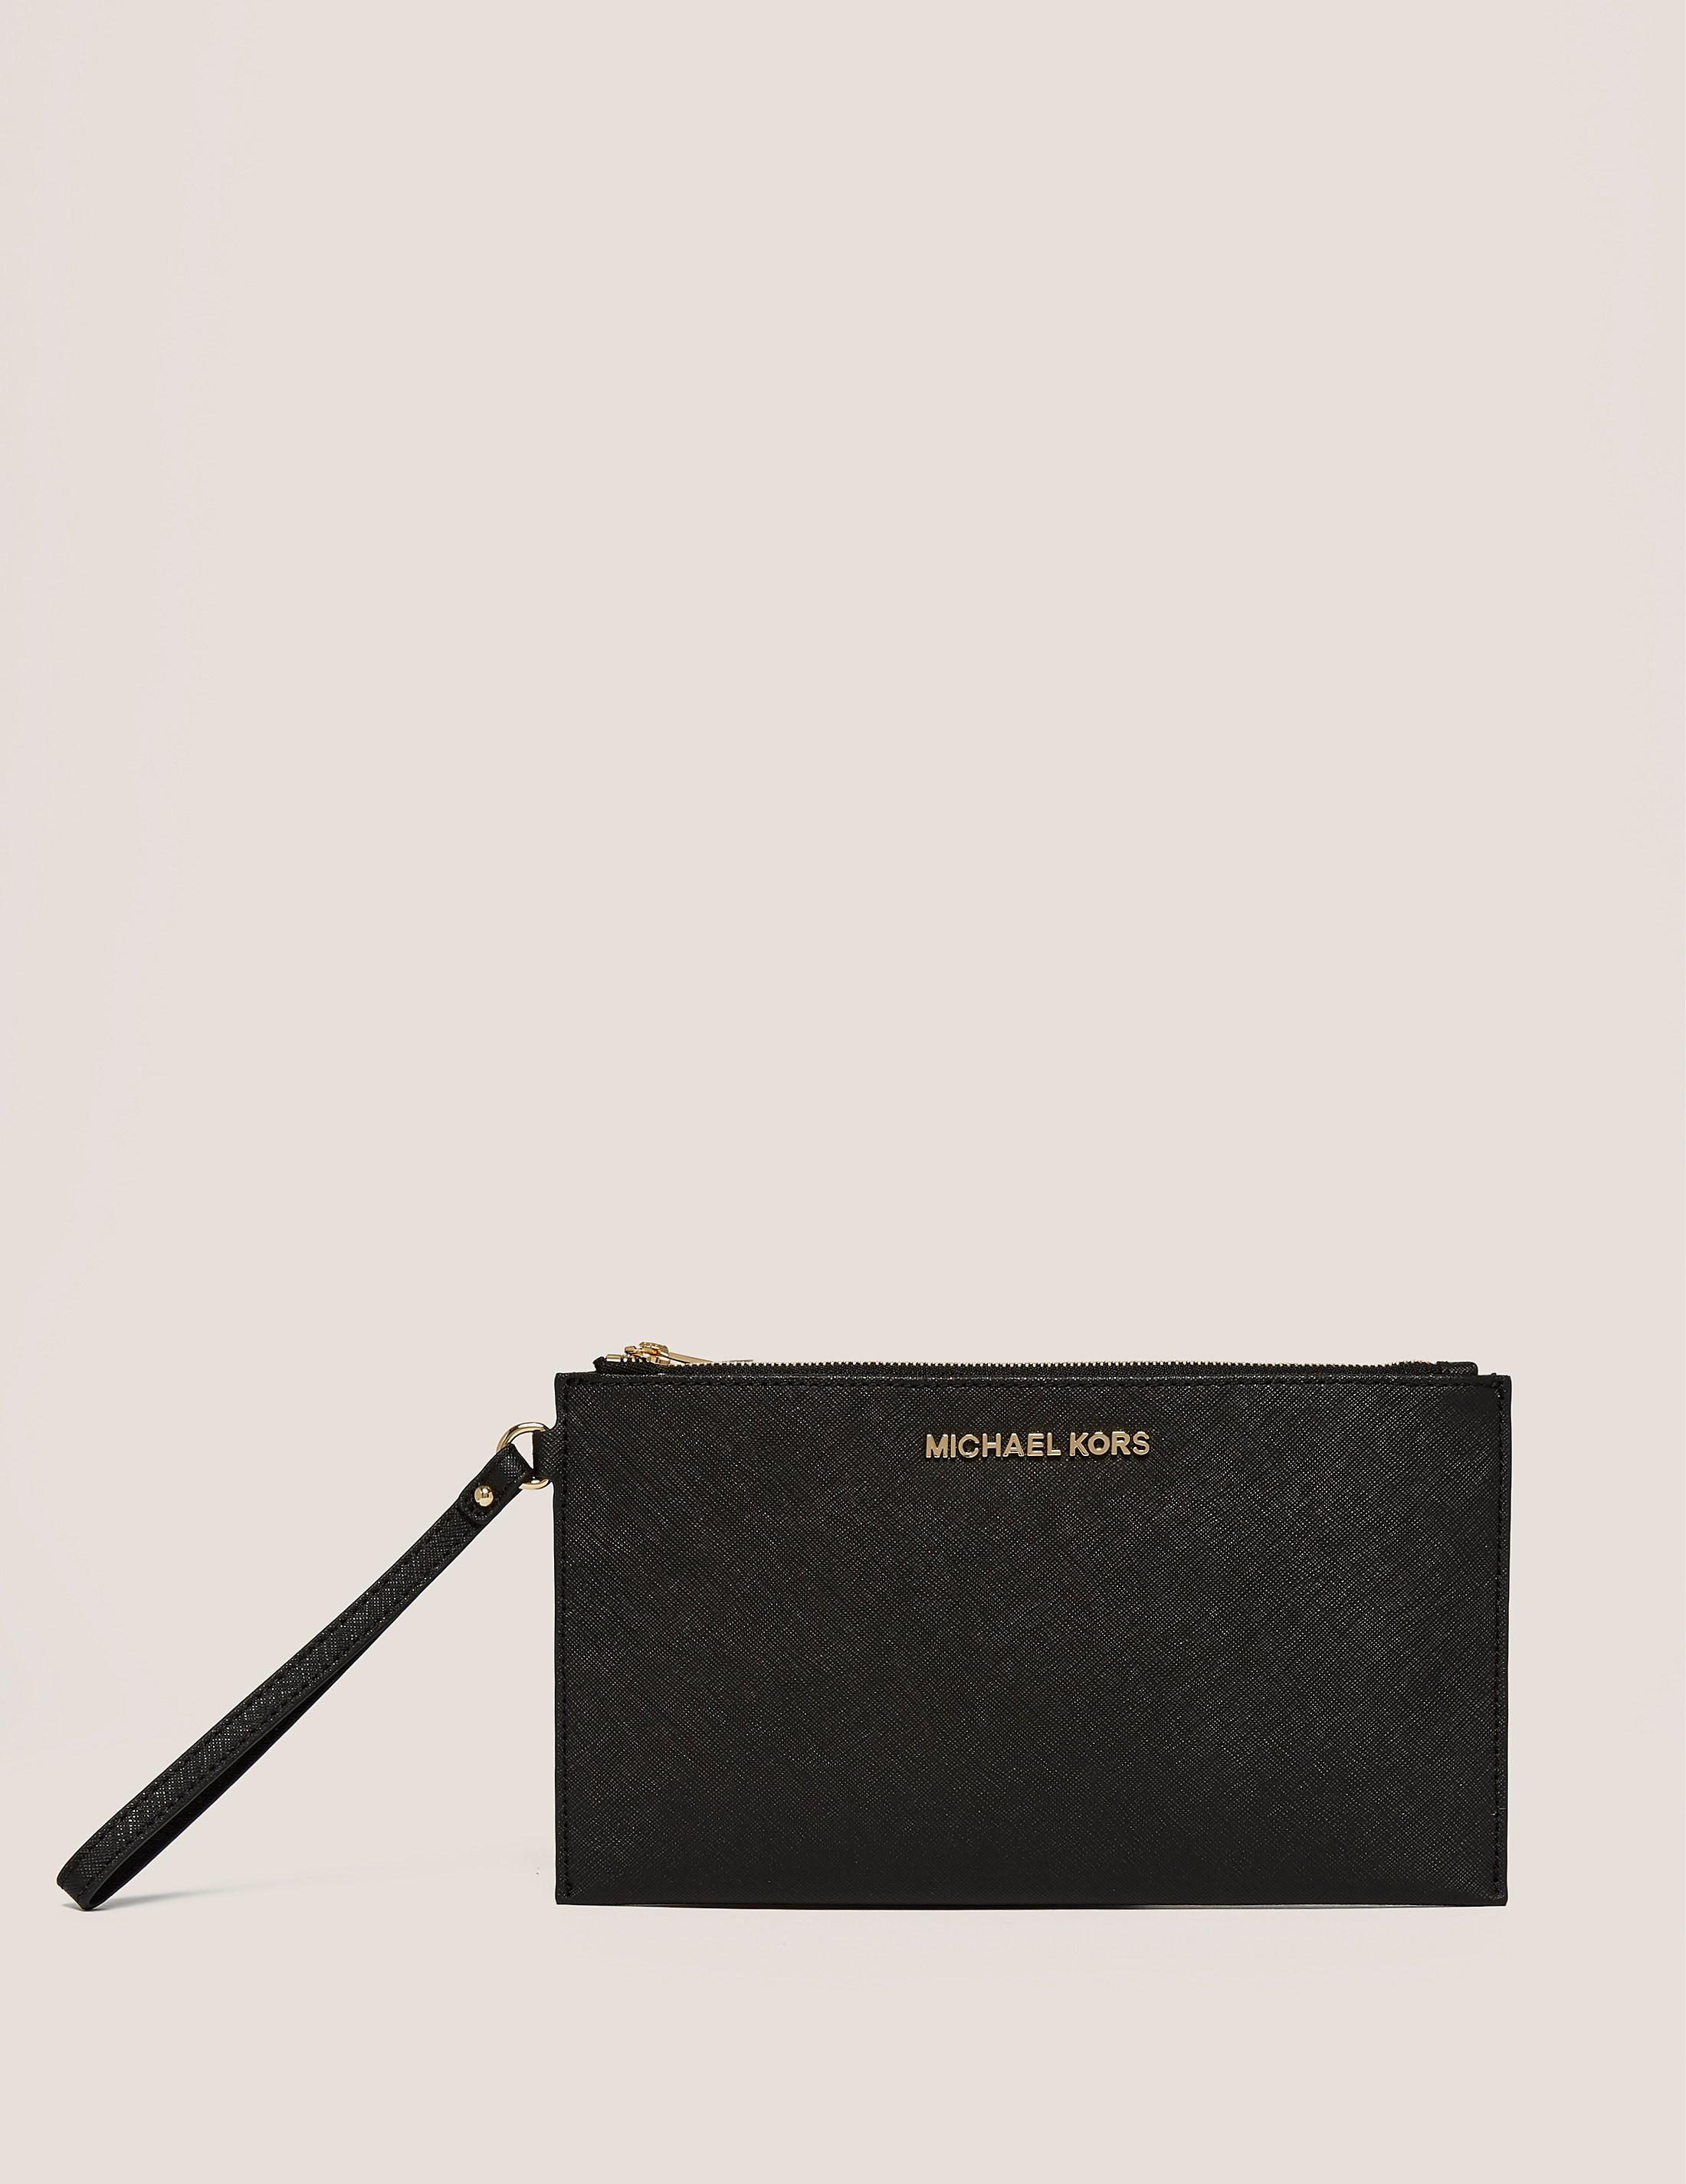 Michael Kors Jet Set Travel Medium Zip Clutch Bag